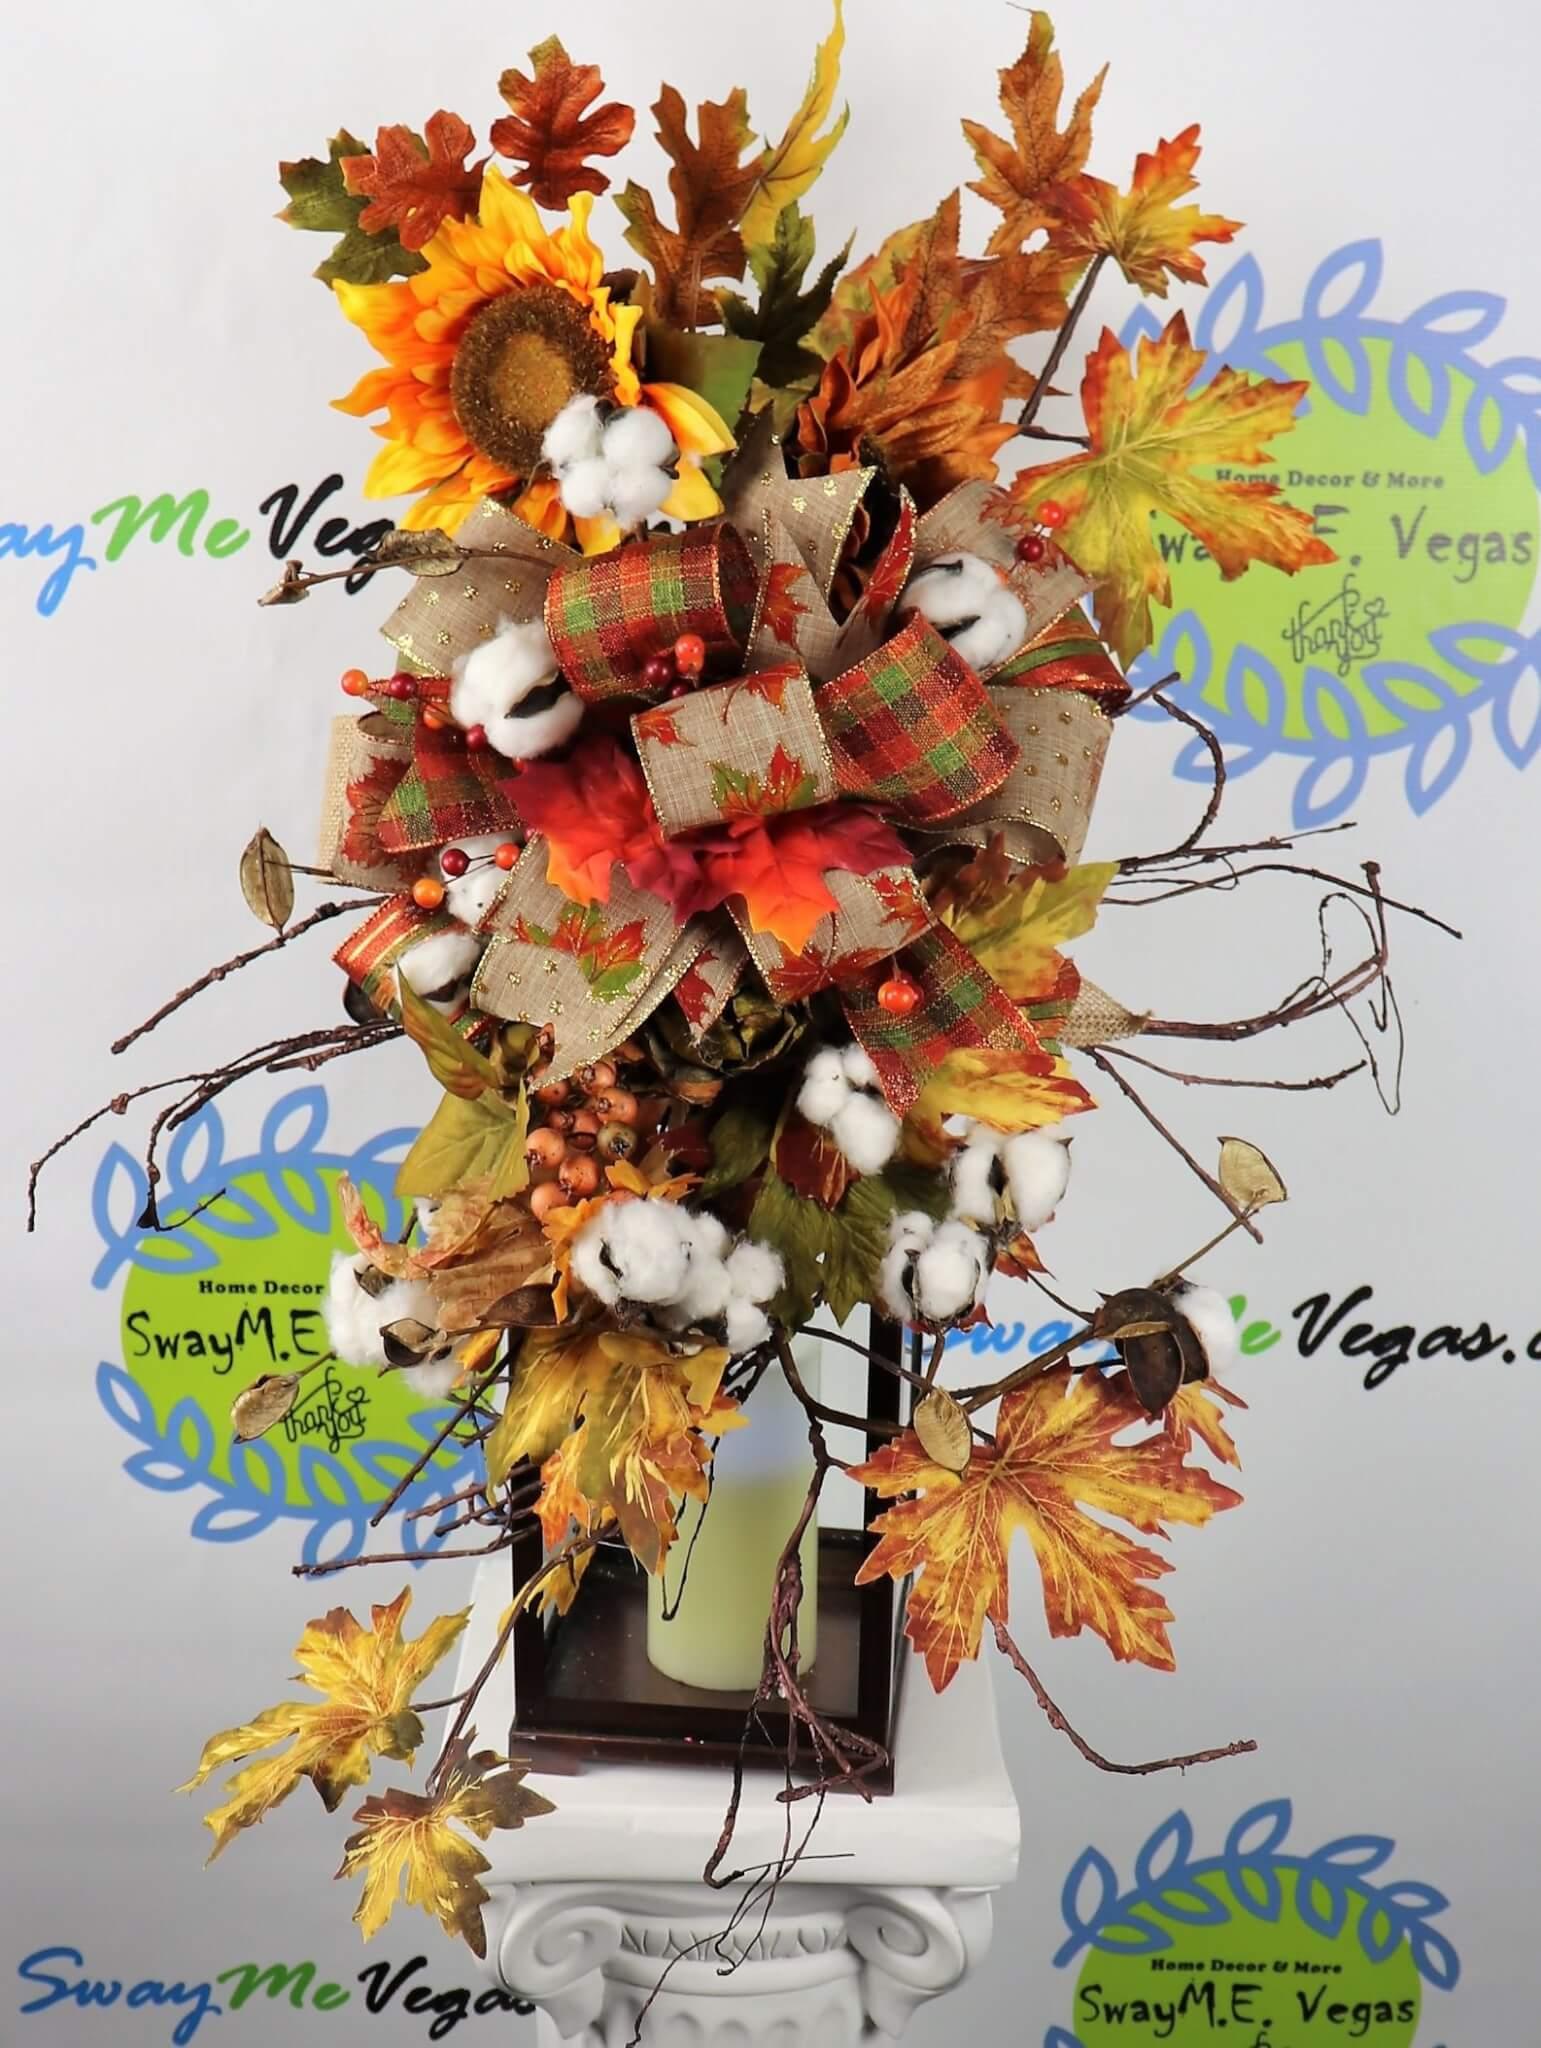 Fall-Cotton-Sunflower-Autumn-Lantern-Swag-Centerpiece-6-e1503210737656 XL Fall Sunflower Lantern Swag